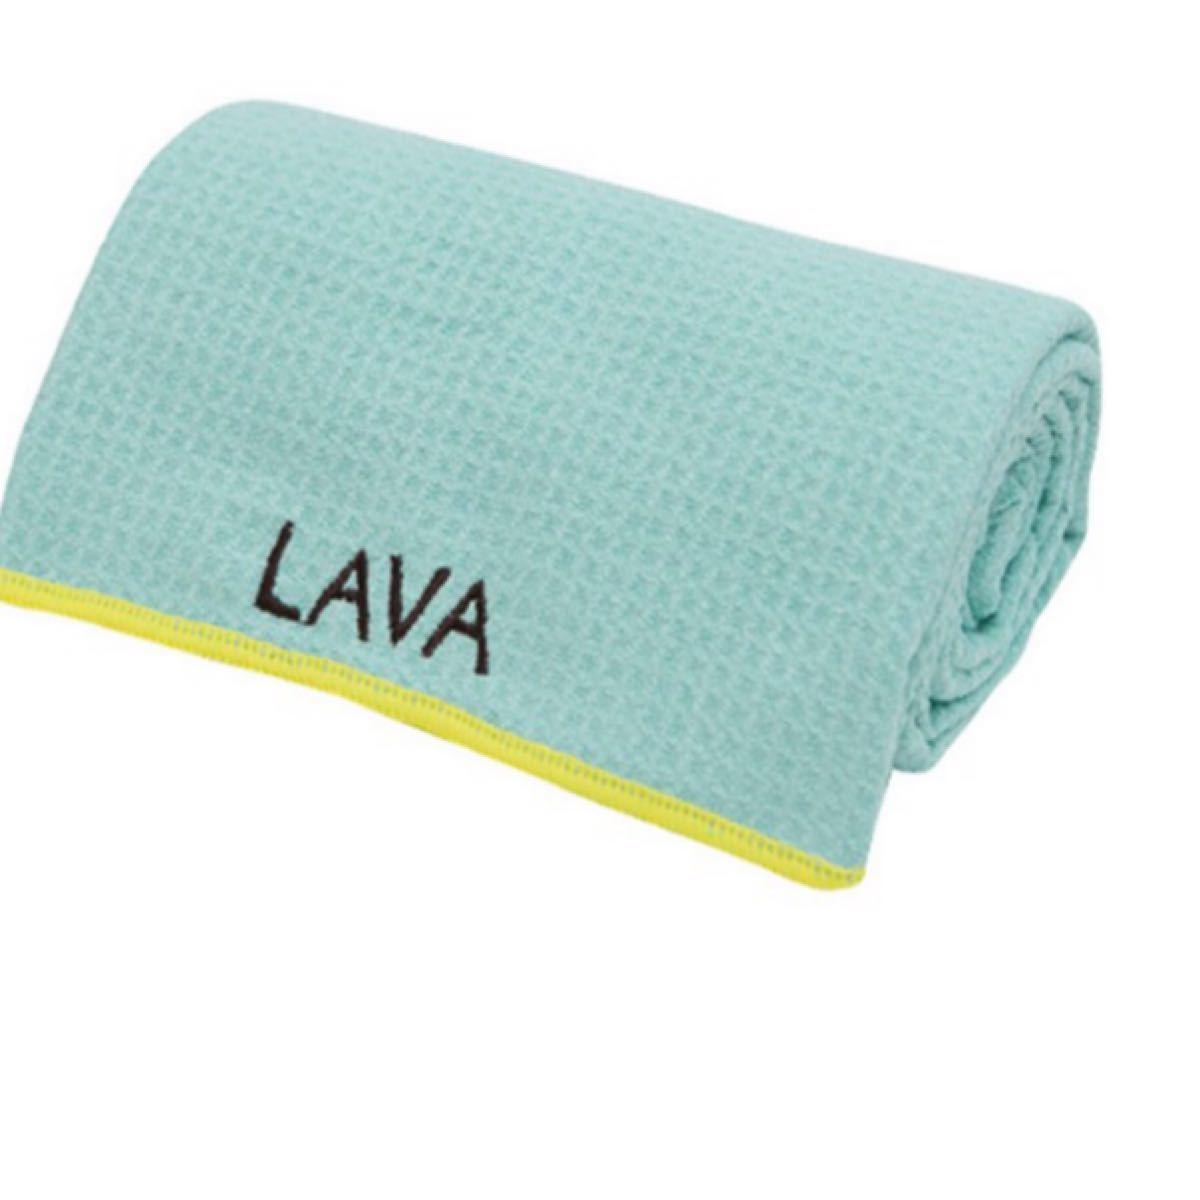 LAVA ヨガラグ未使用ミントグリーン